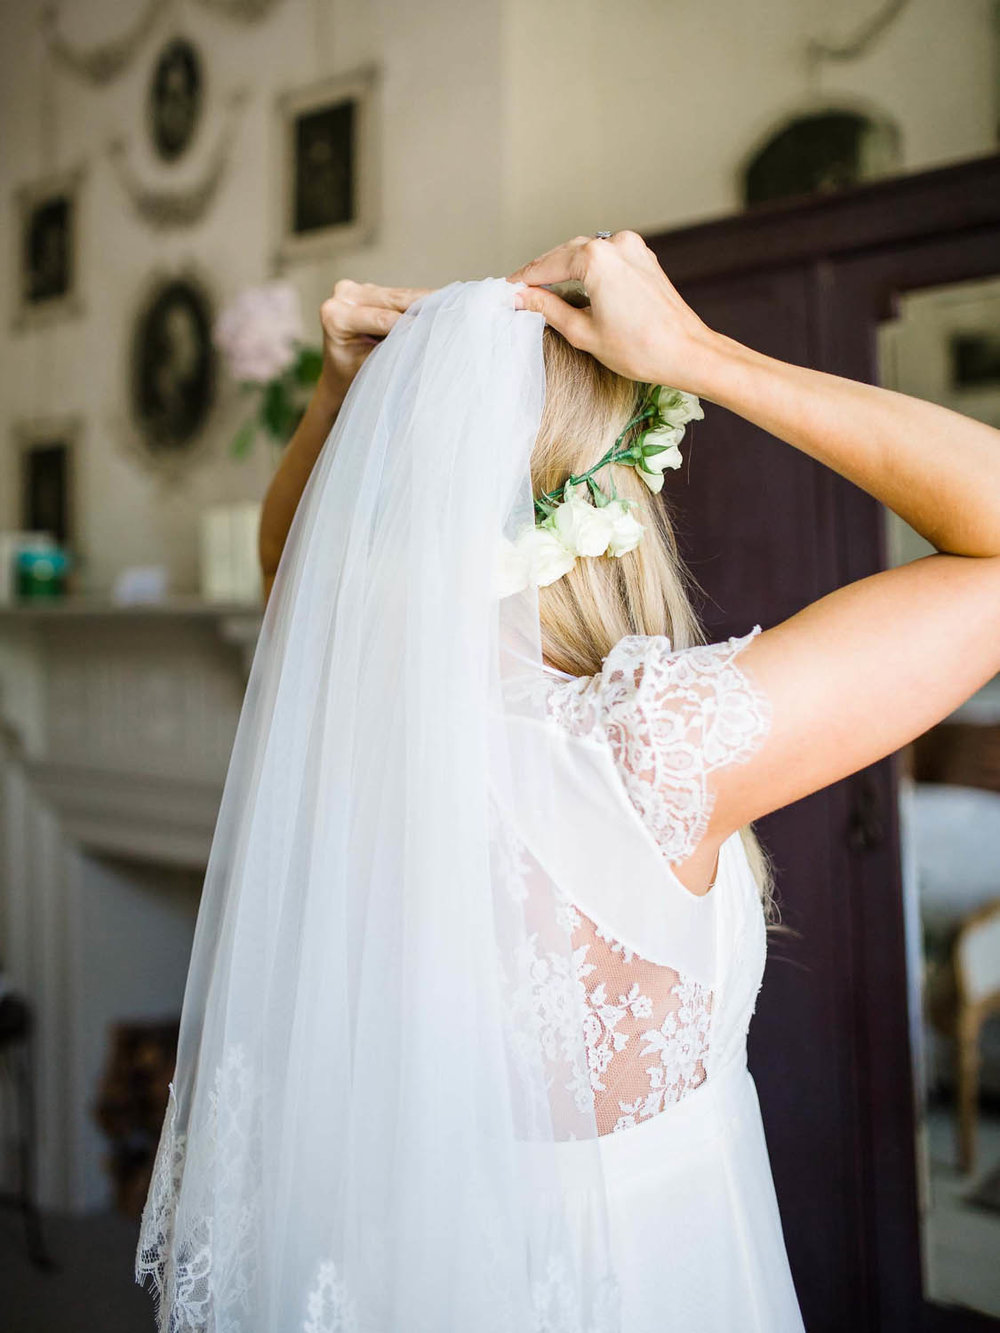 Amy O'Boyle Photography, Destination & UK Fine Art Film Wedding Photographer, Hastings Wedding-1.jpg